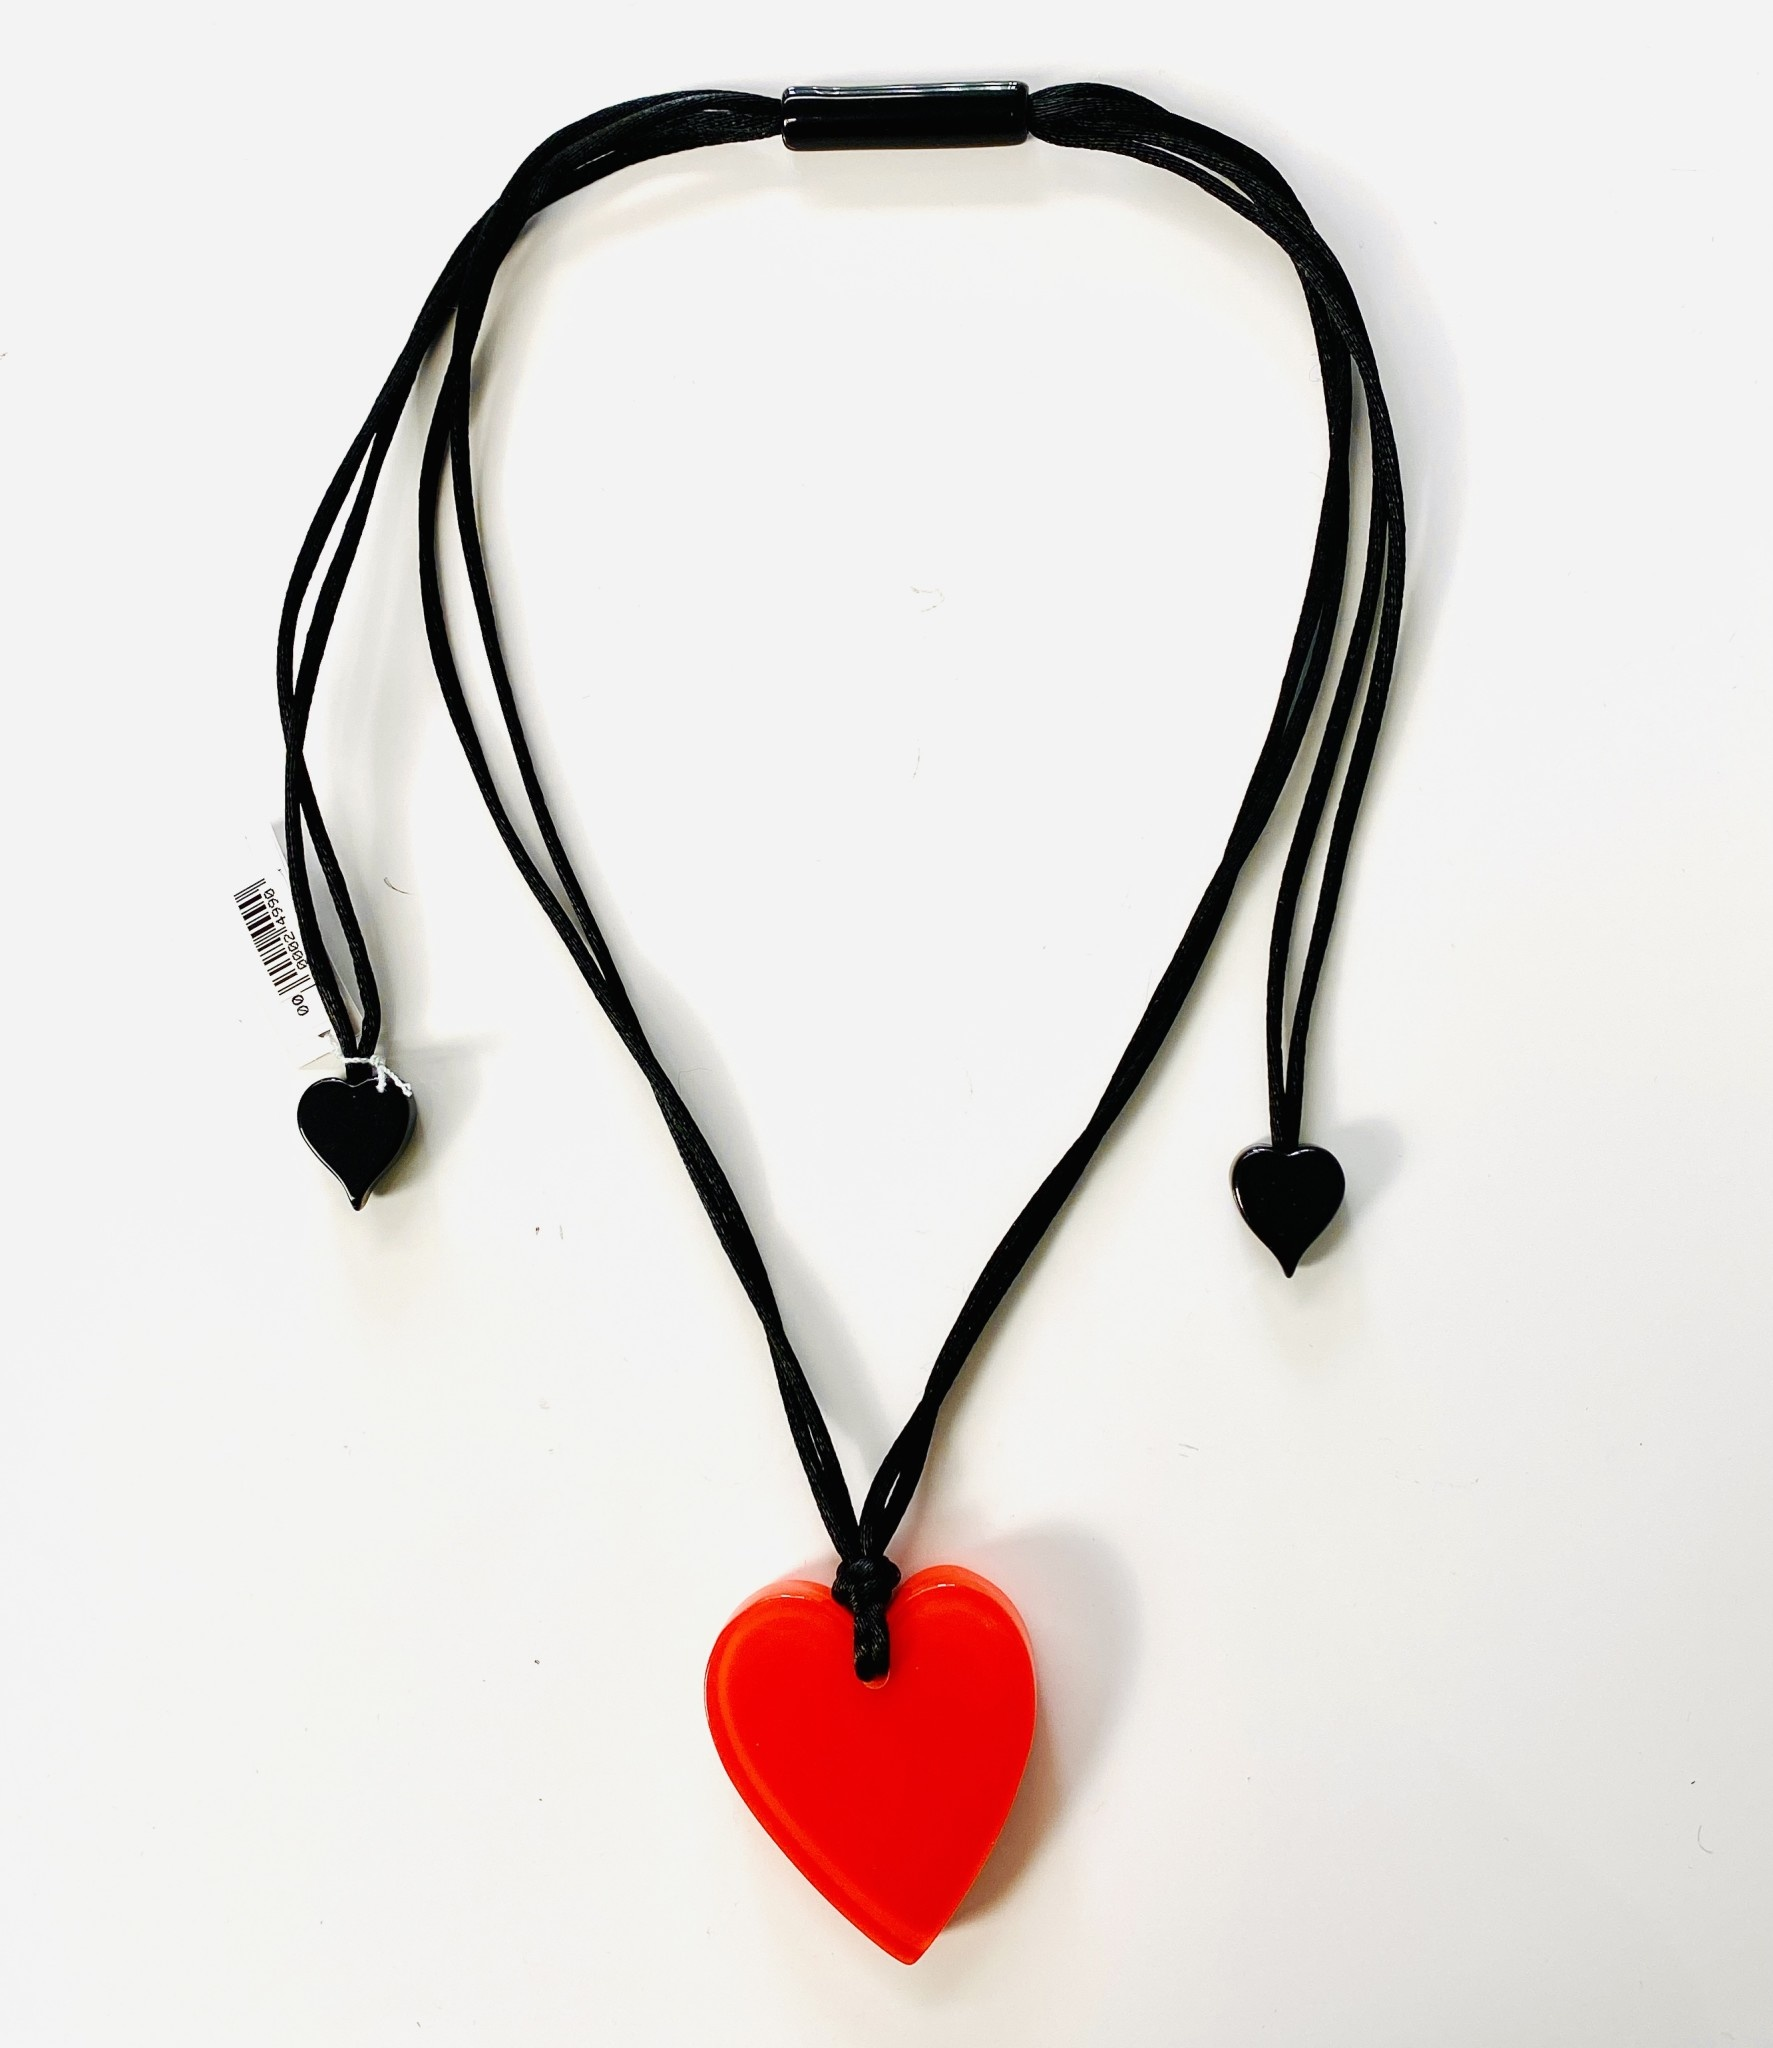 zsiska 5060204 ZSISKA SMALL HEART 9206/ORANGE